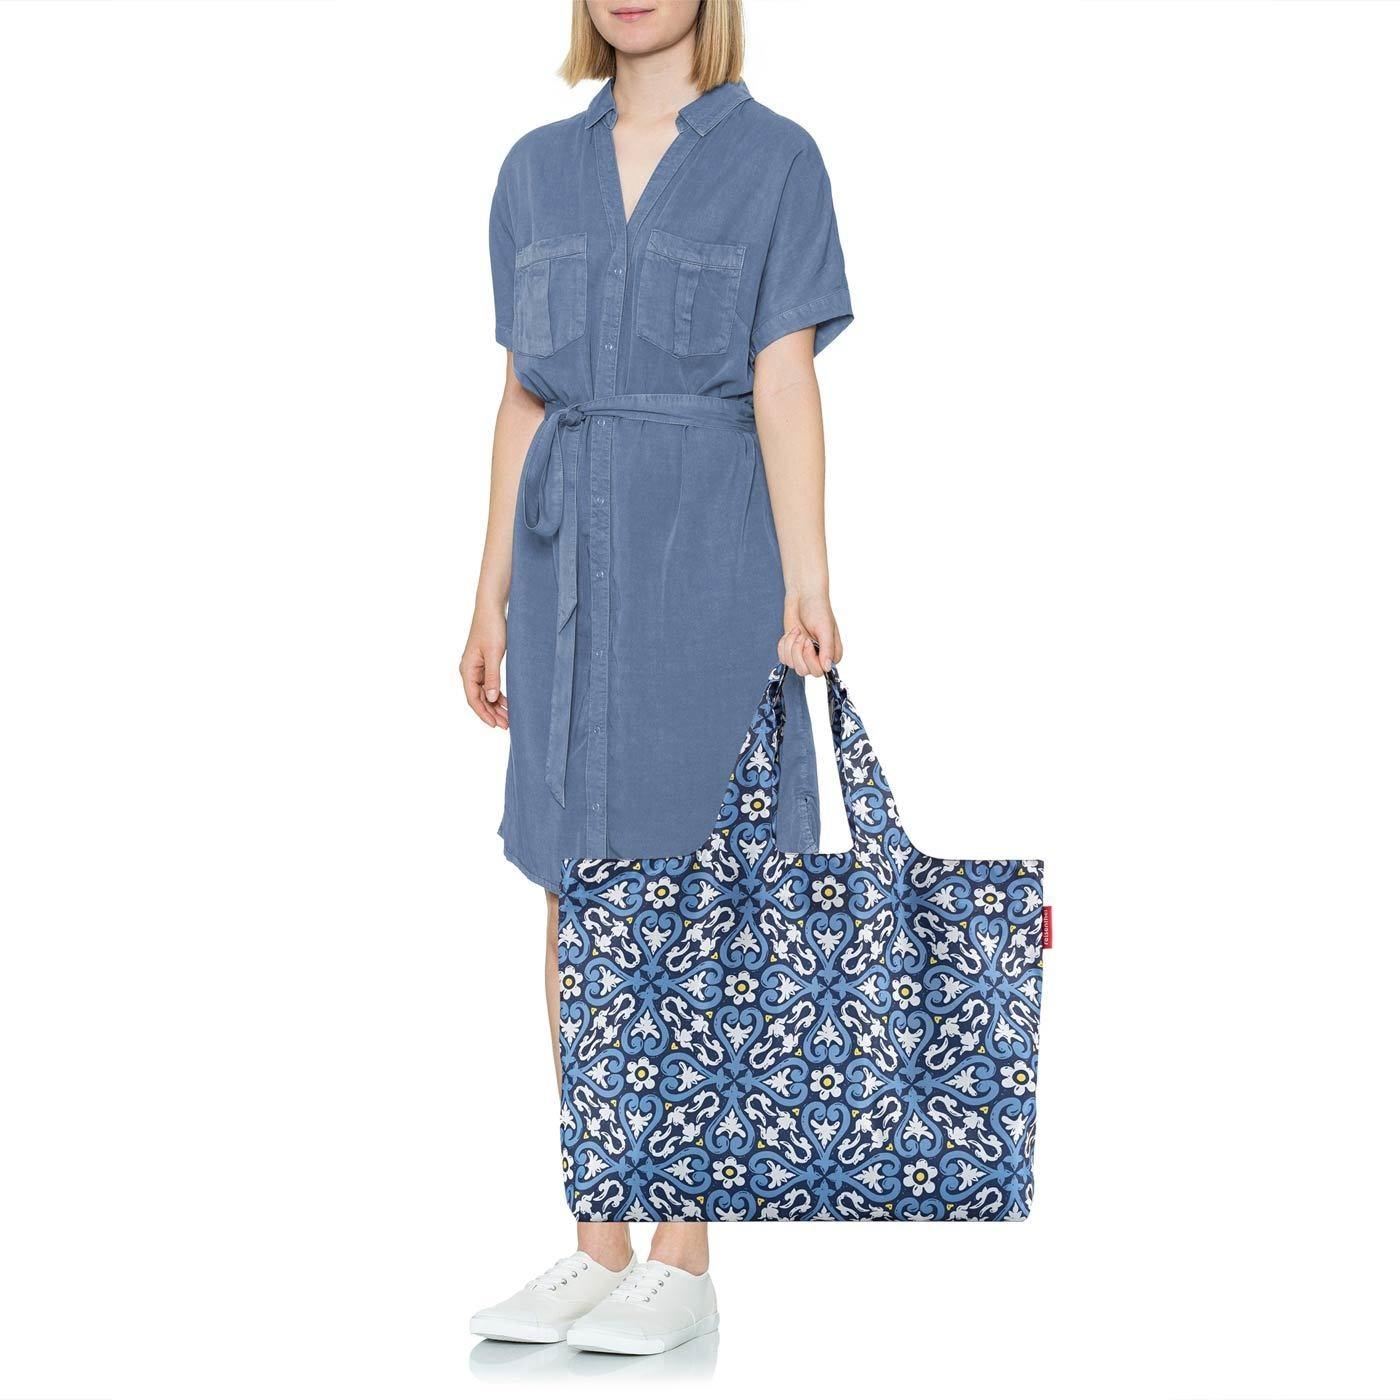 Skládací taška Mini Maxi Beachbag floral 1_1